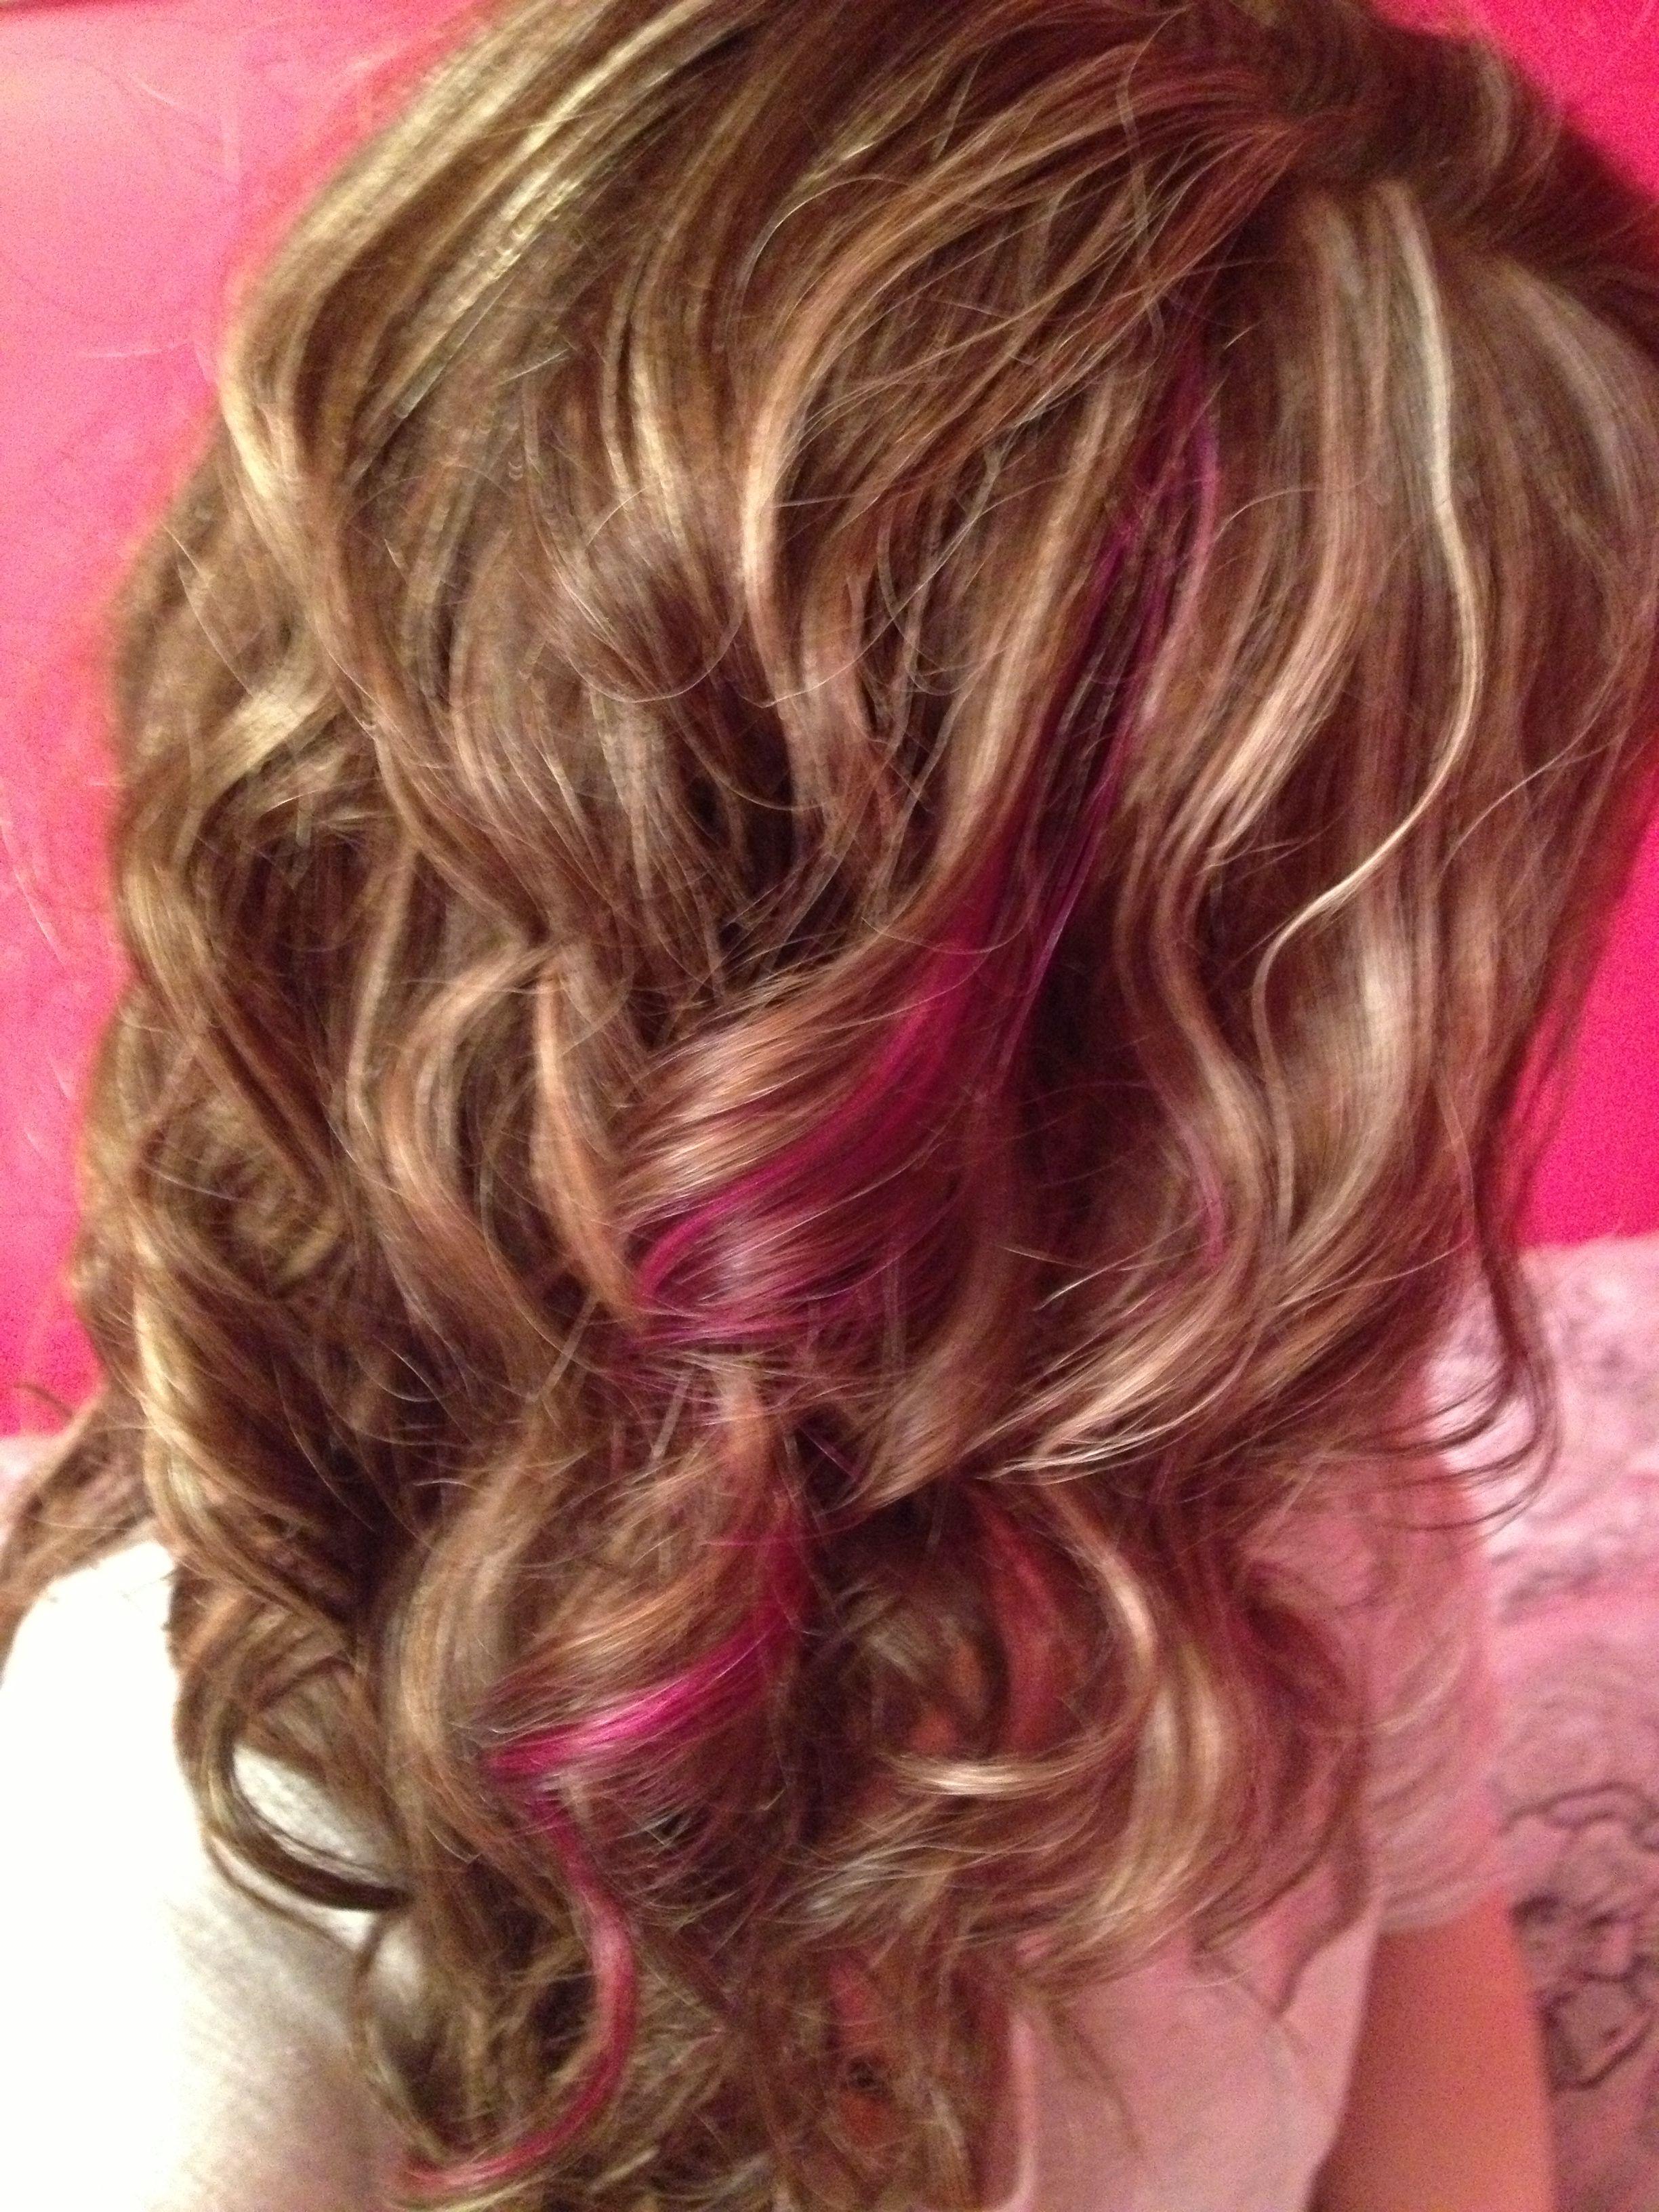 Pink Peekaboo Curls Highlights Hair On The Go 705 716 3343 Hair Highlights Brown Hair Colors Blonde Hair With Highlights